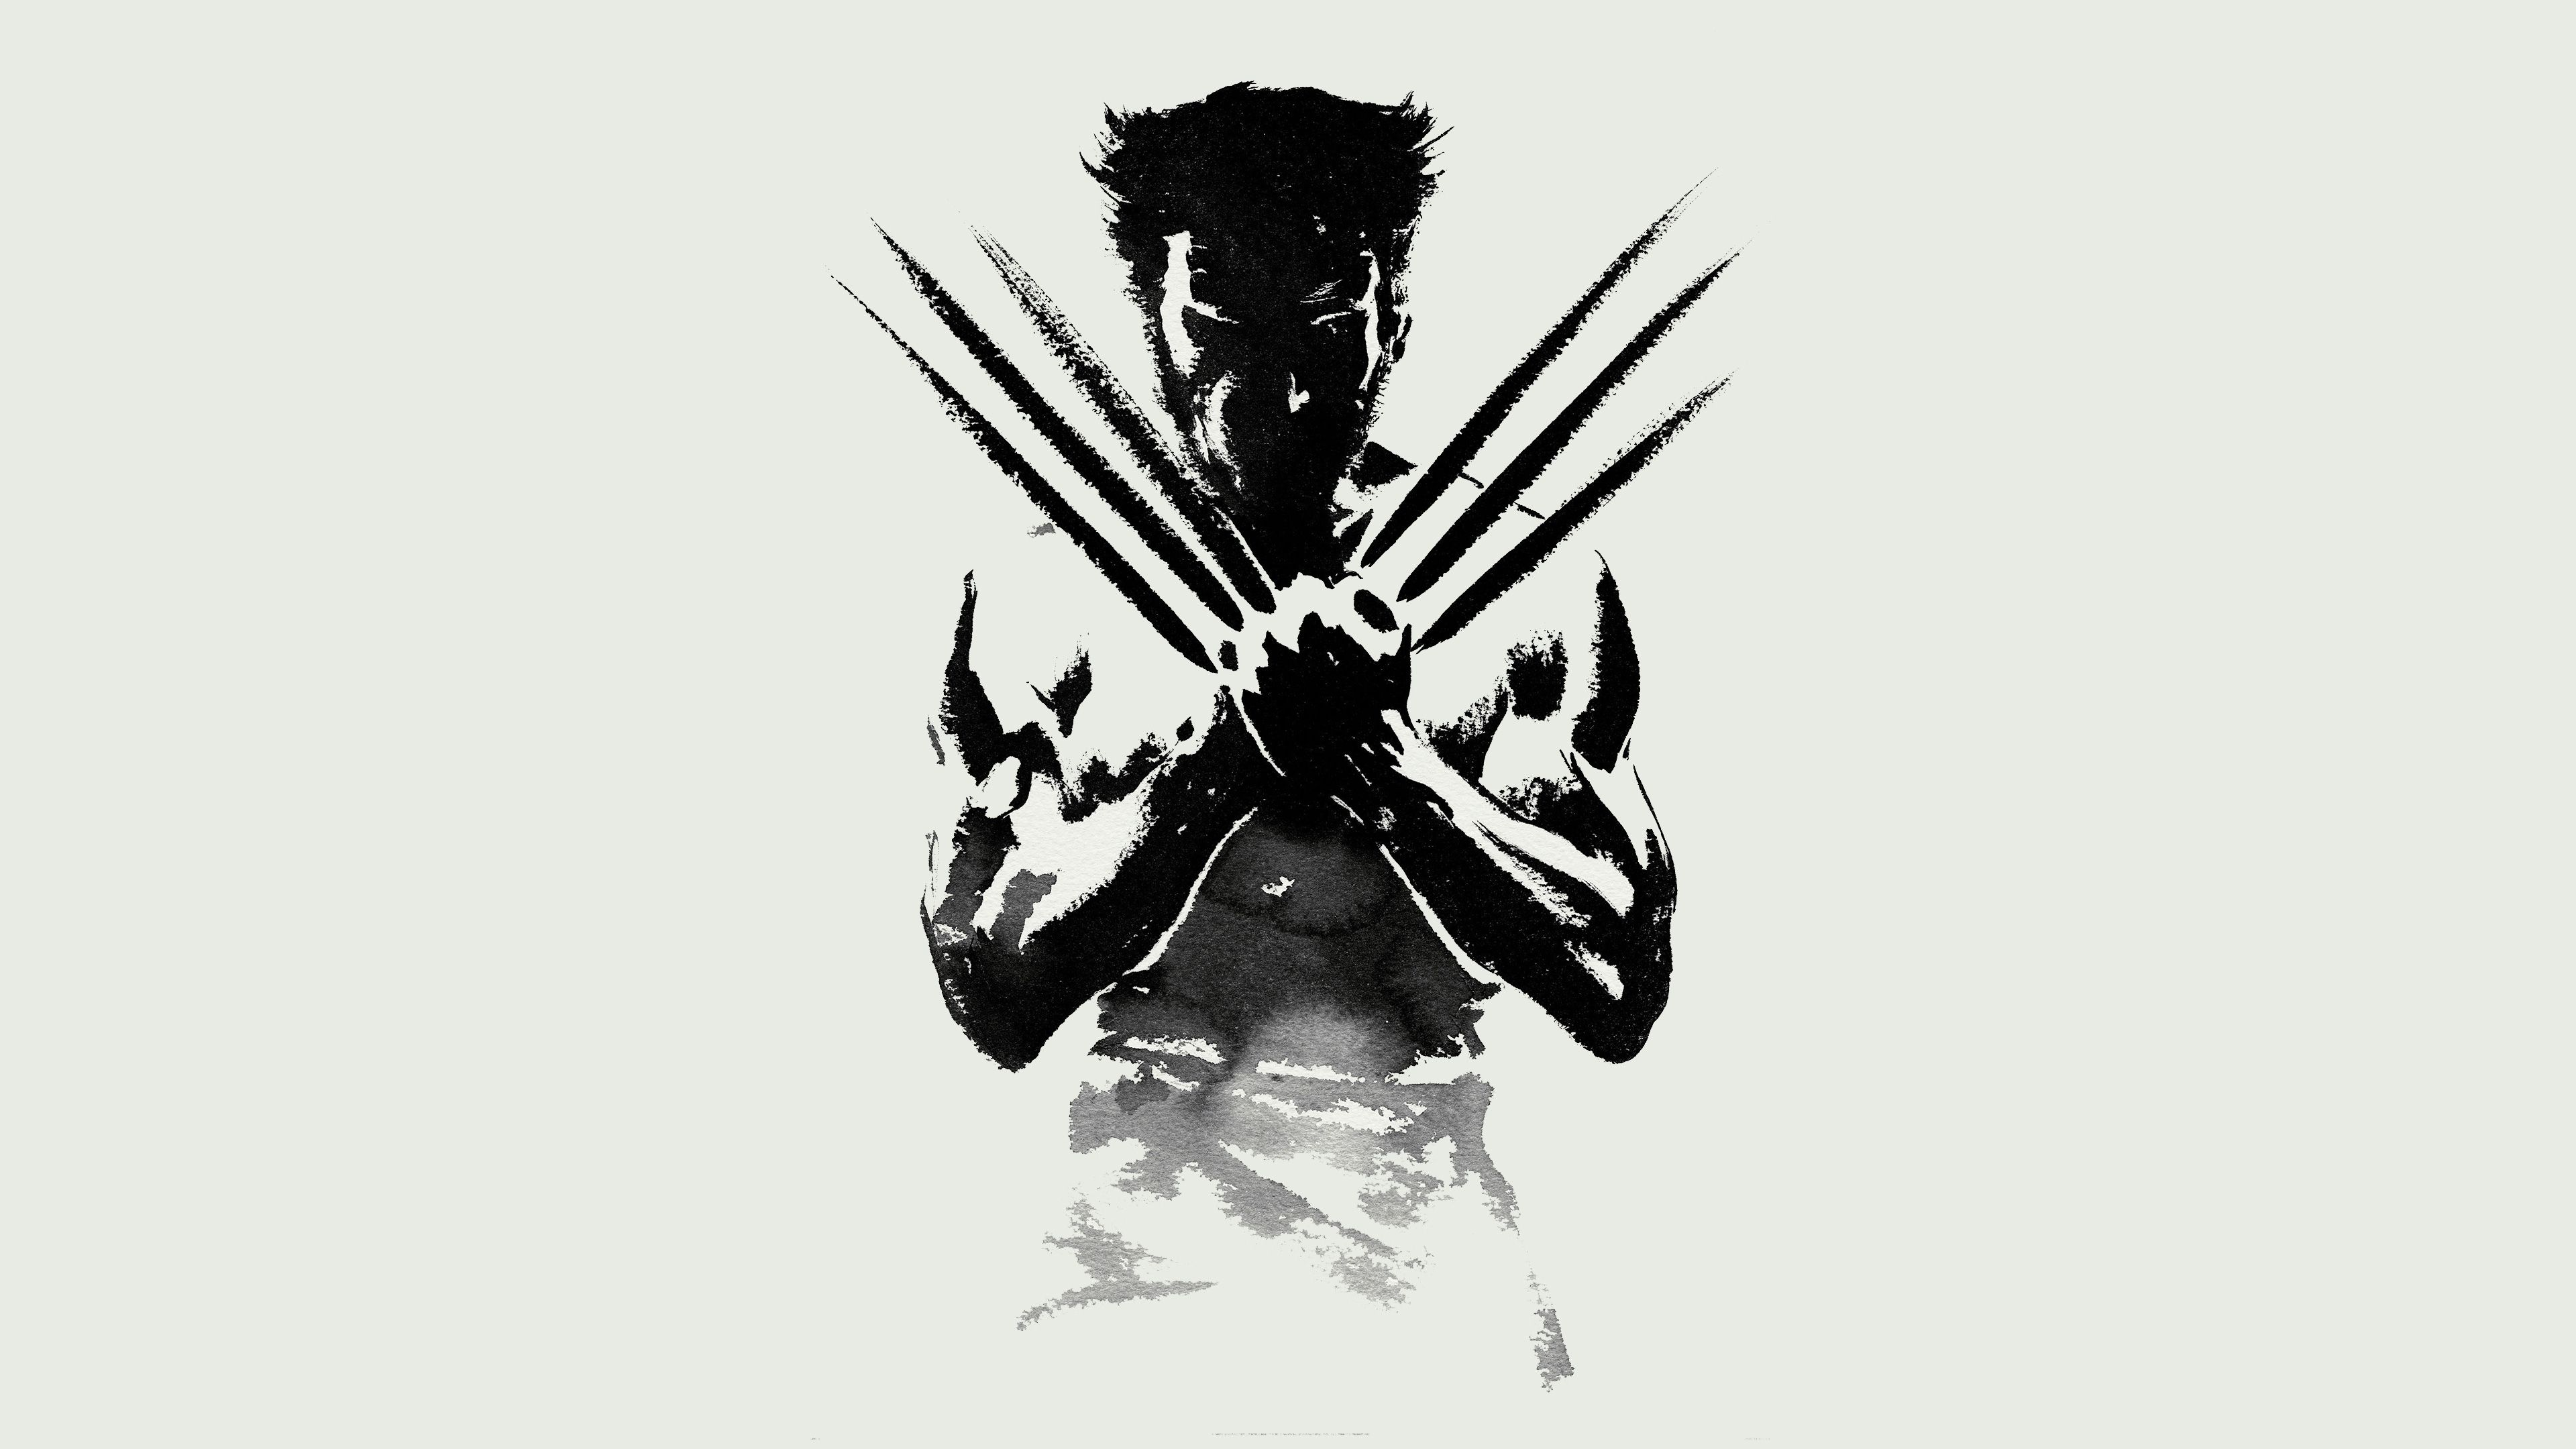 Wolverine Art 4k Wolverine Wallpapers Superheroes Wallpapers Digital Art Wallpapers Artwork Wallpapers 4k Wal Wolverine Art Wolverine Artwork Art Wallpaper